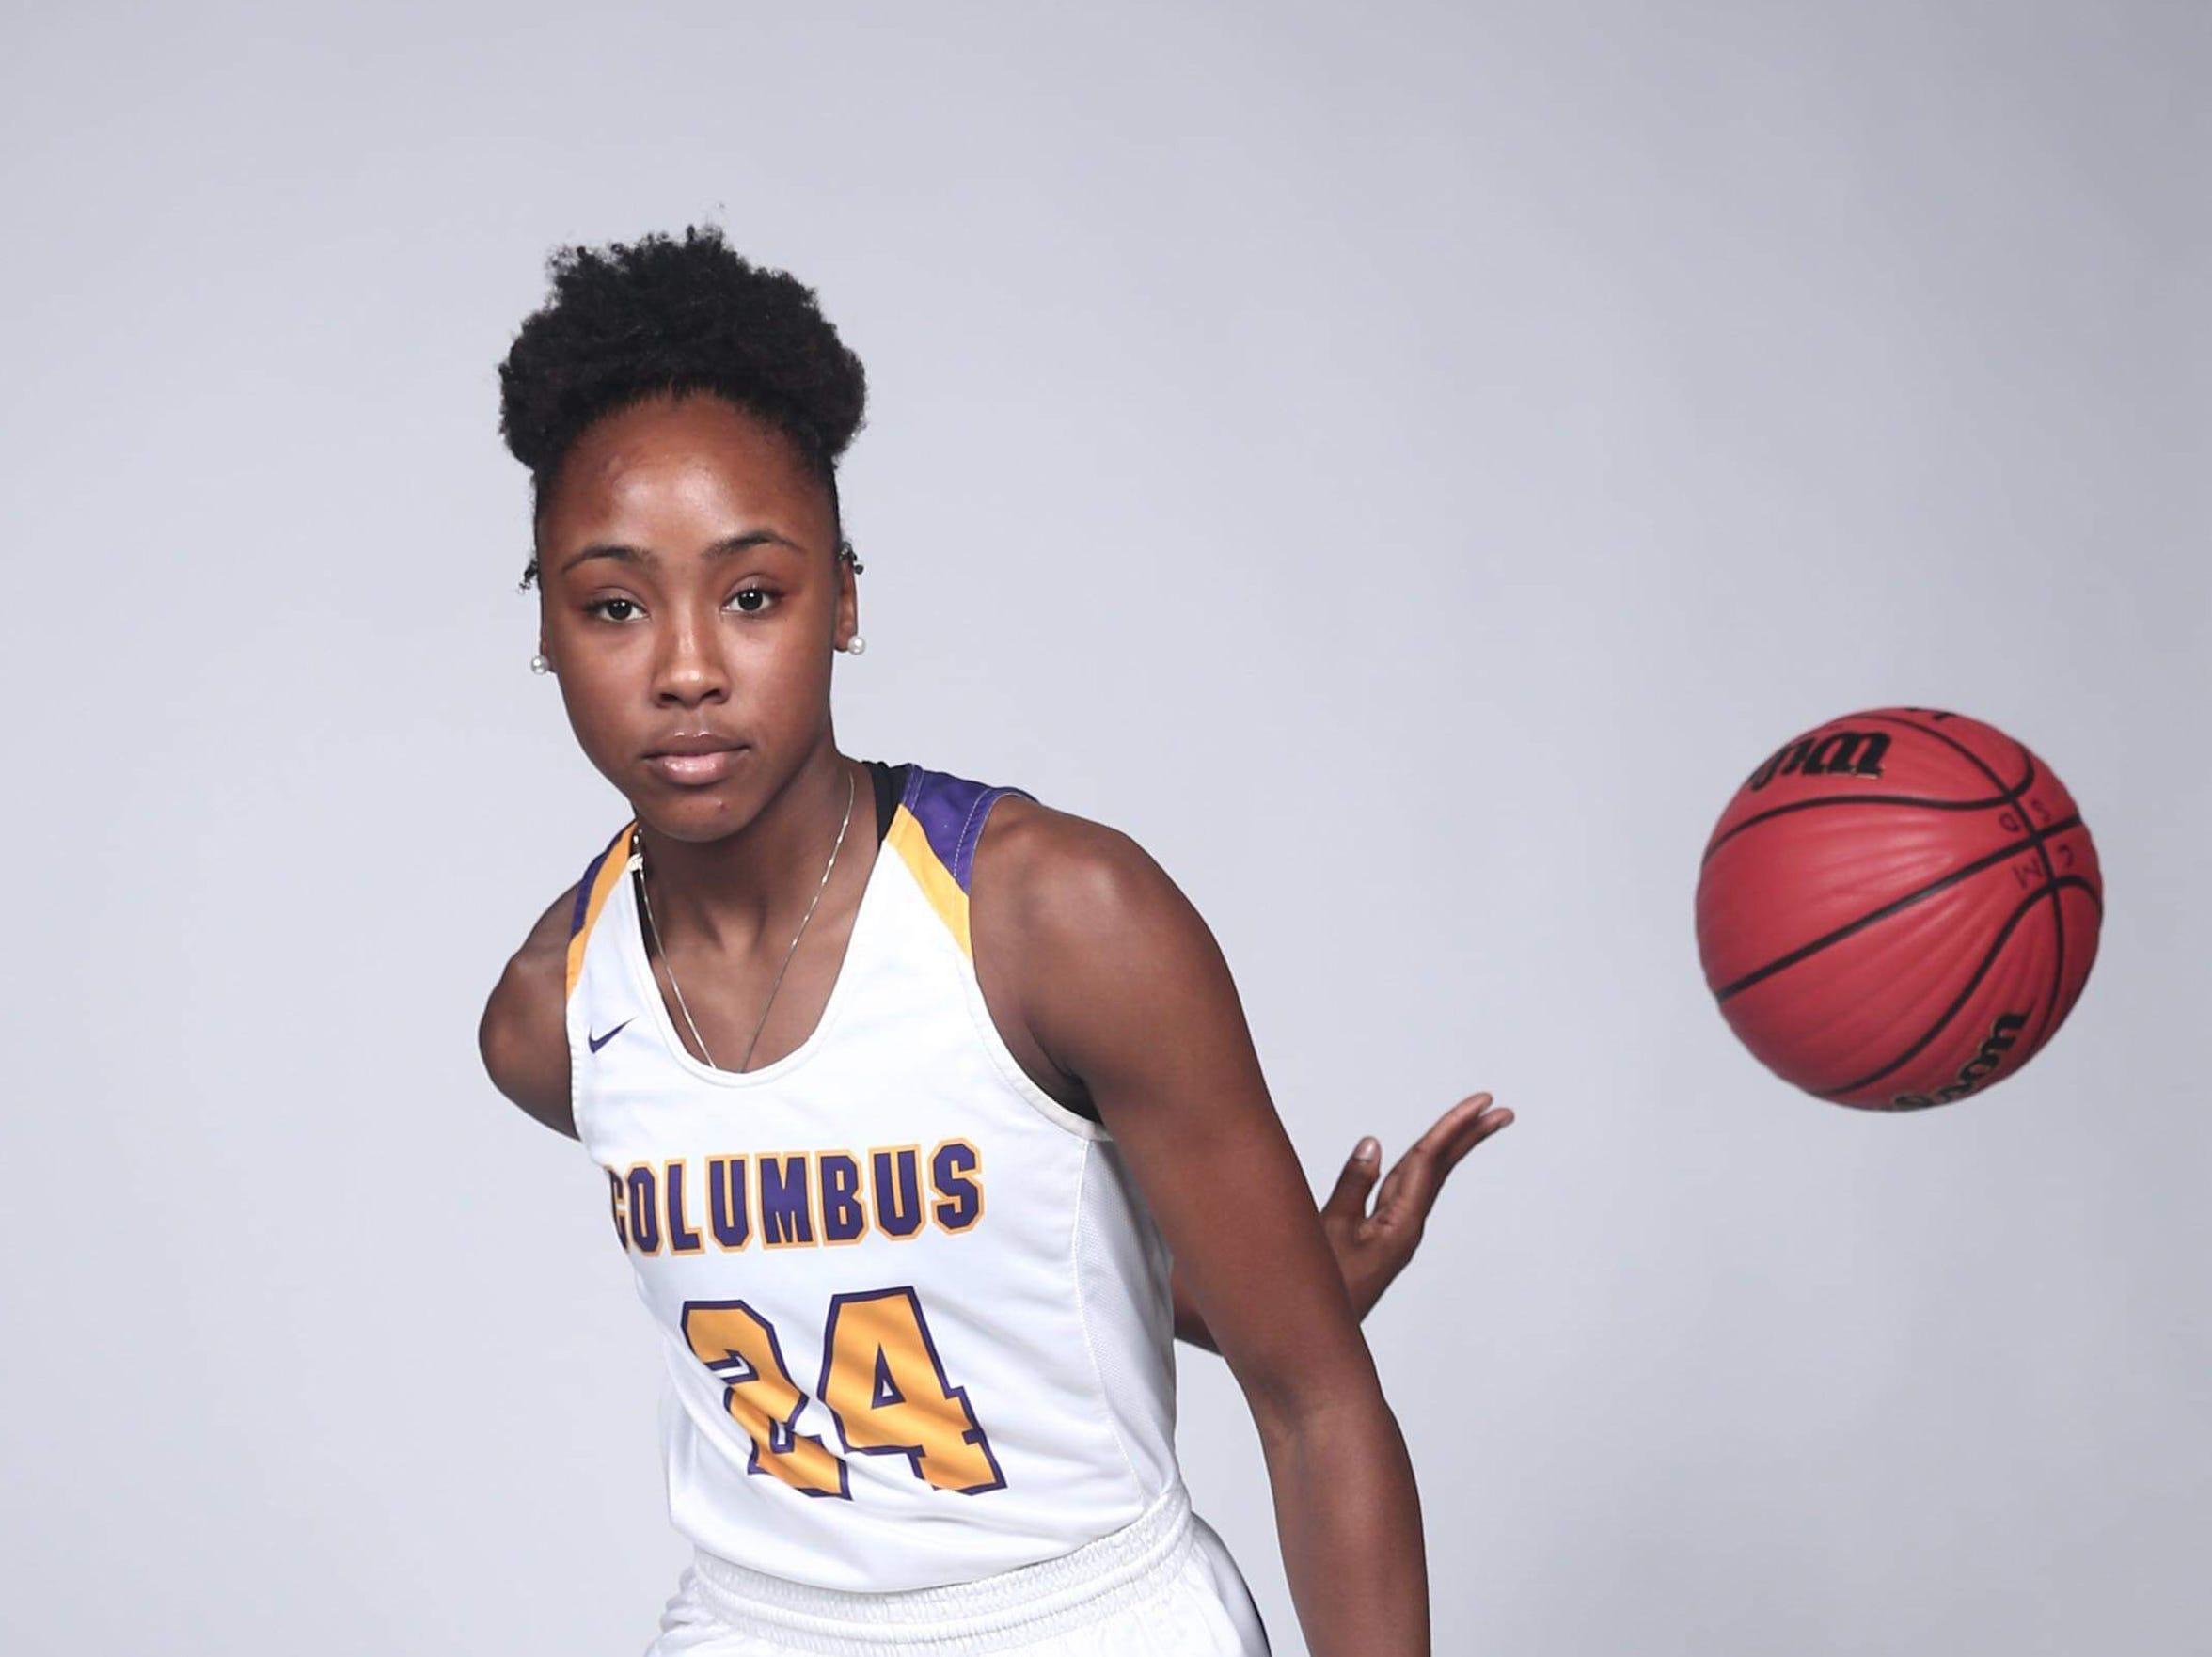 Hannah White, a guard at Columbus, earned a spot on the 2018-19 Dandy Dozen.